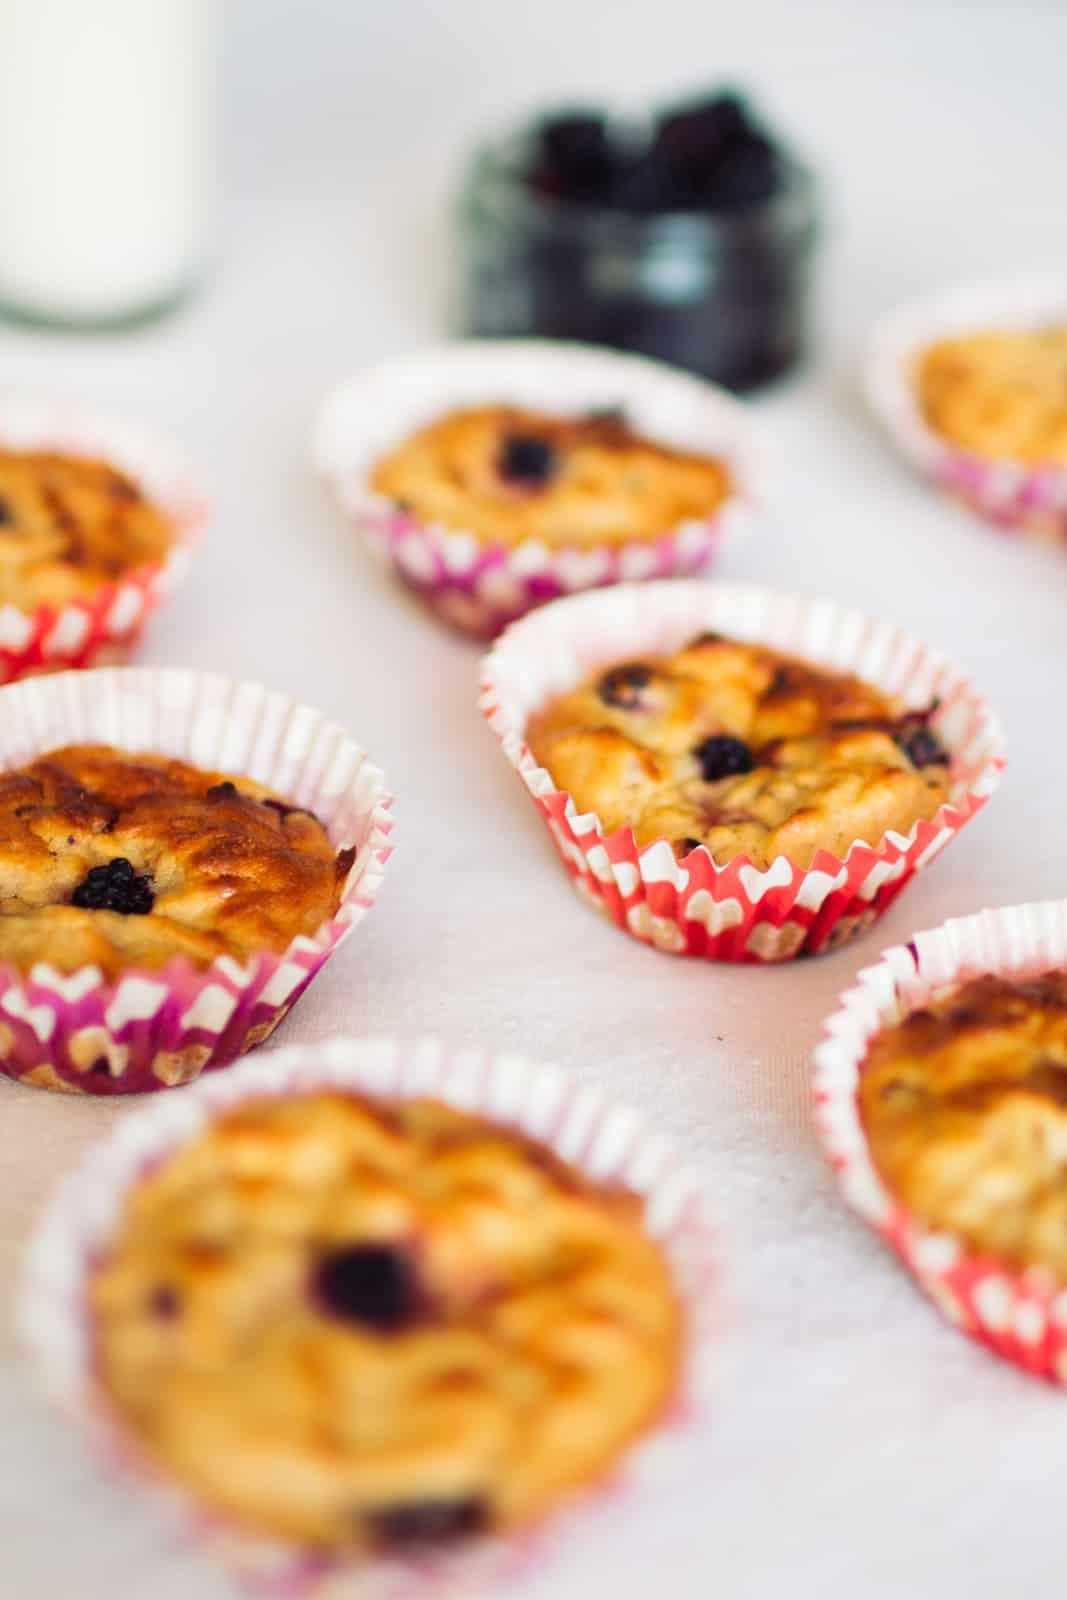 Apple Blueberry Muffins Recipe Autumn Food Ideas Wedding Favours-8